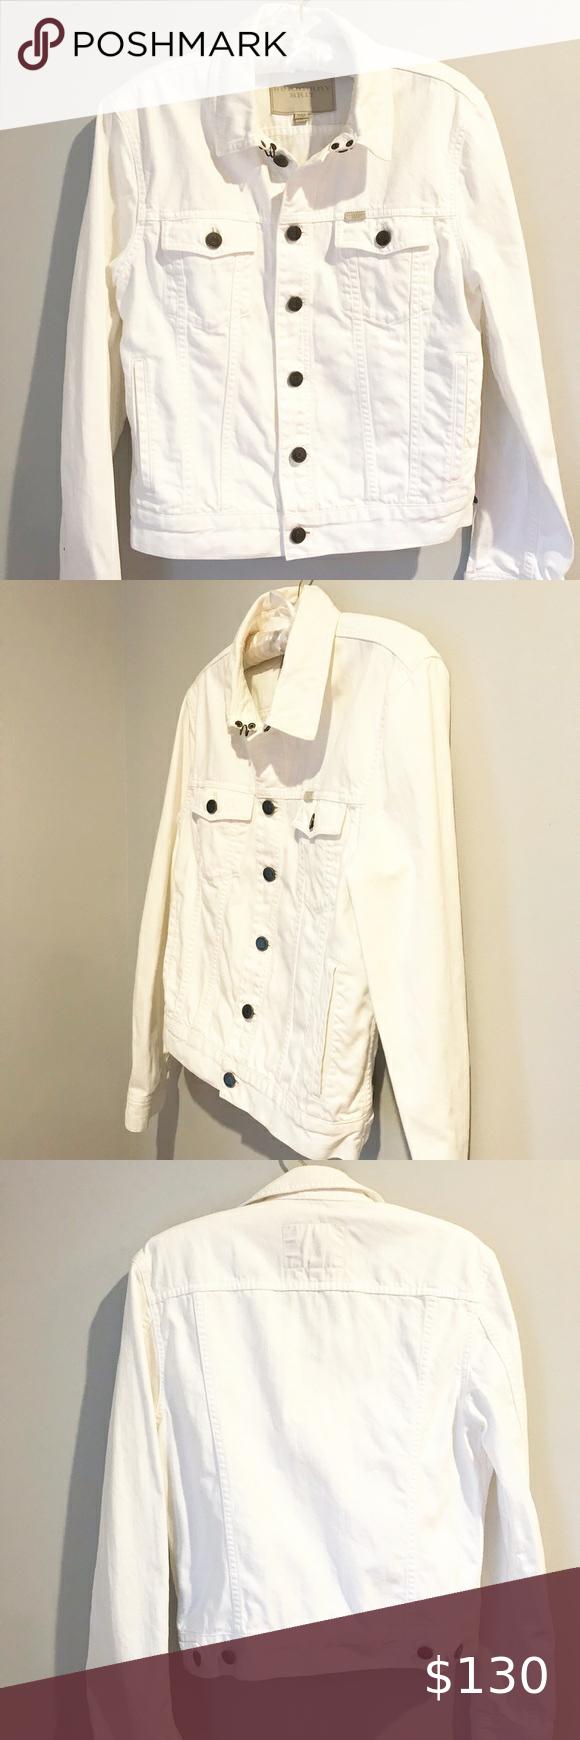 Burberry Brit White Denim Jacket Size M в 2020 г